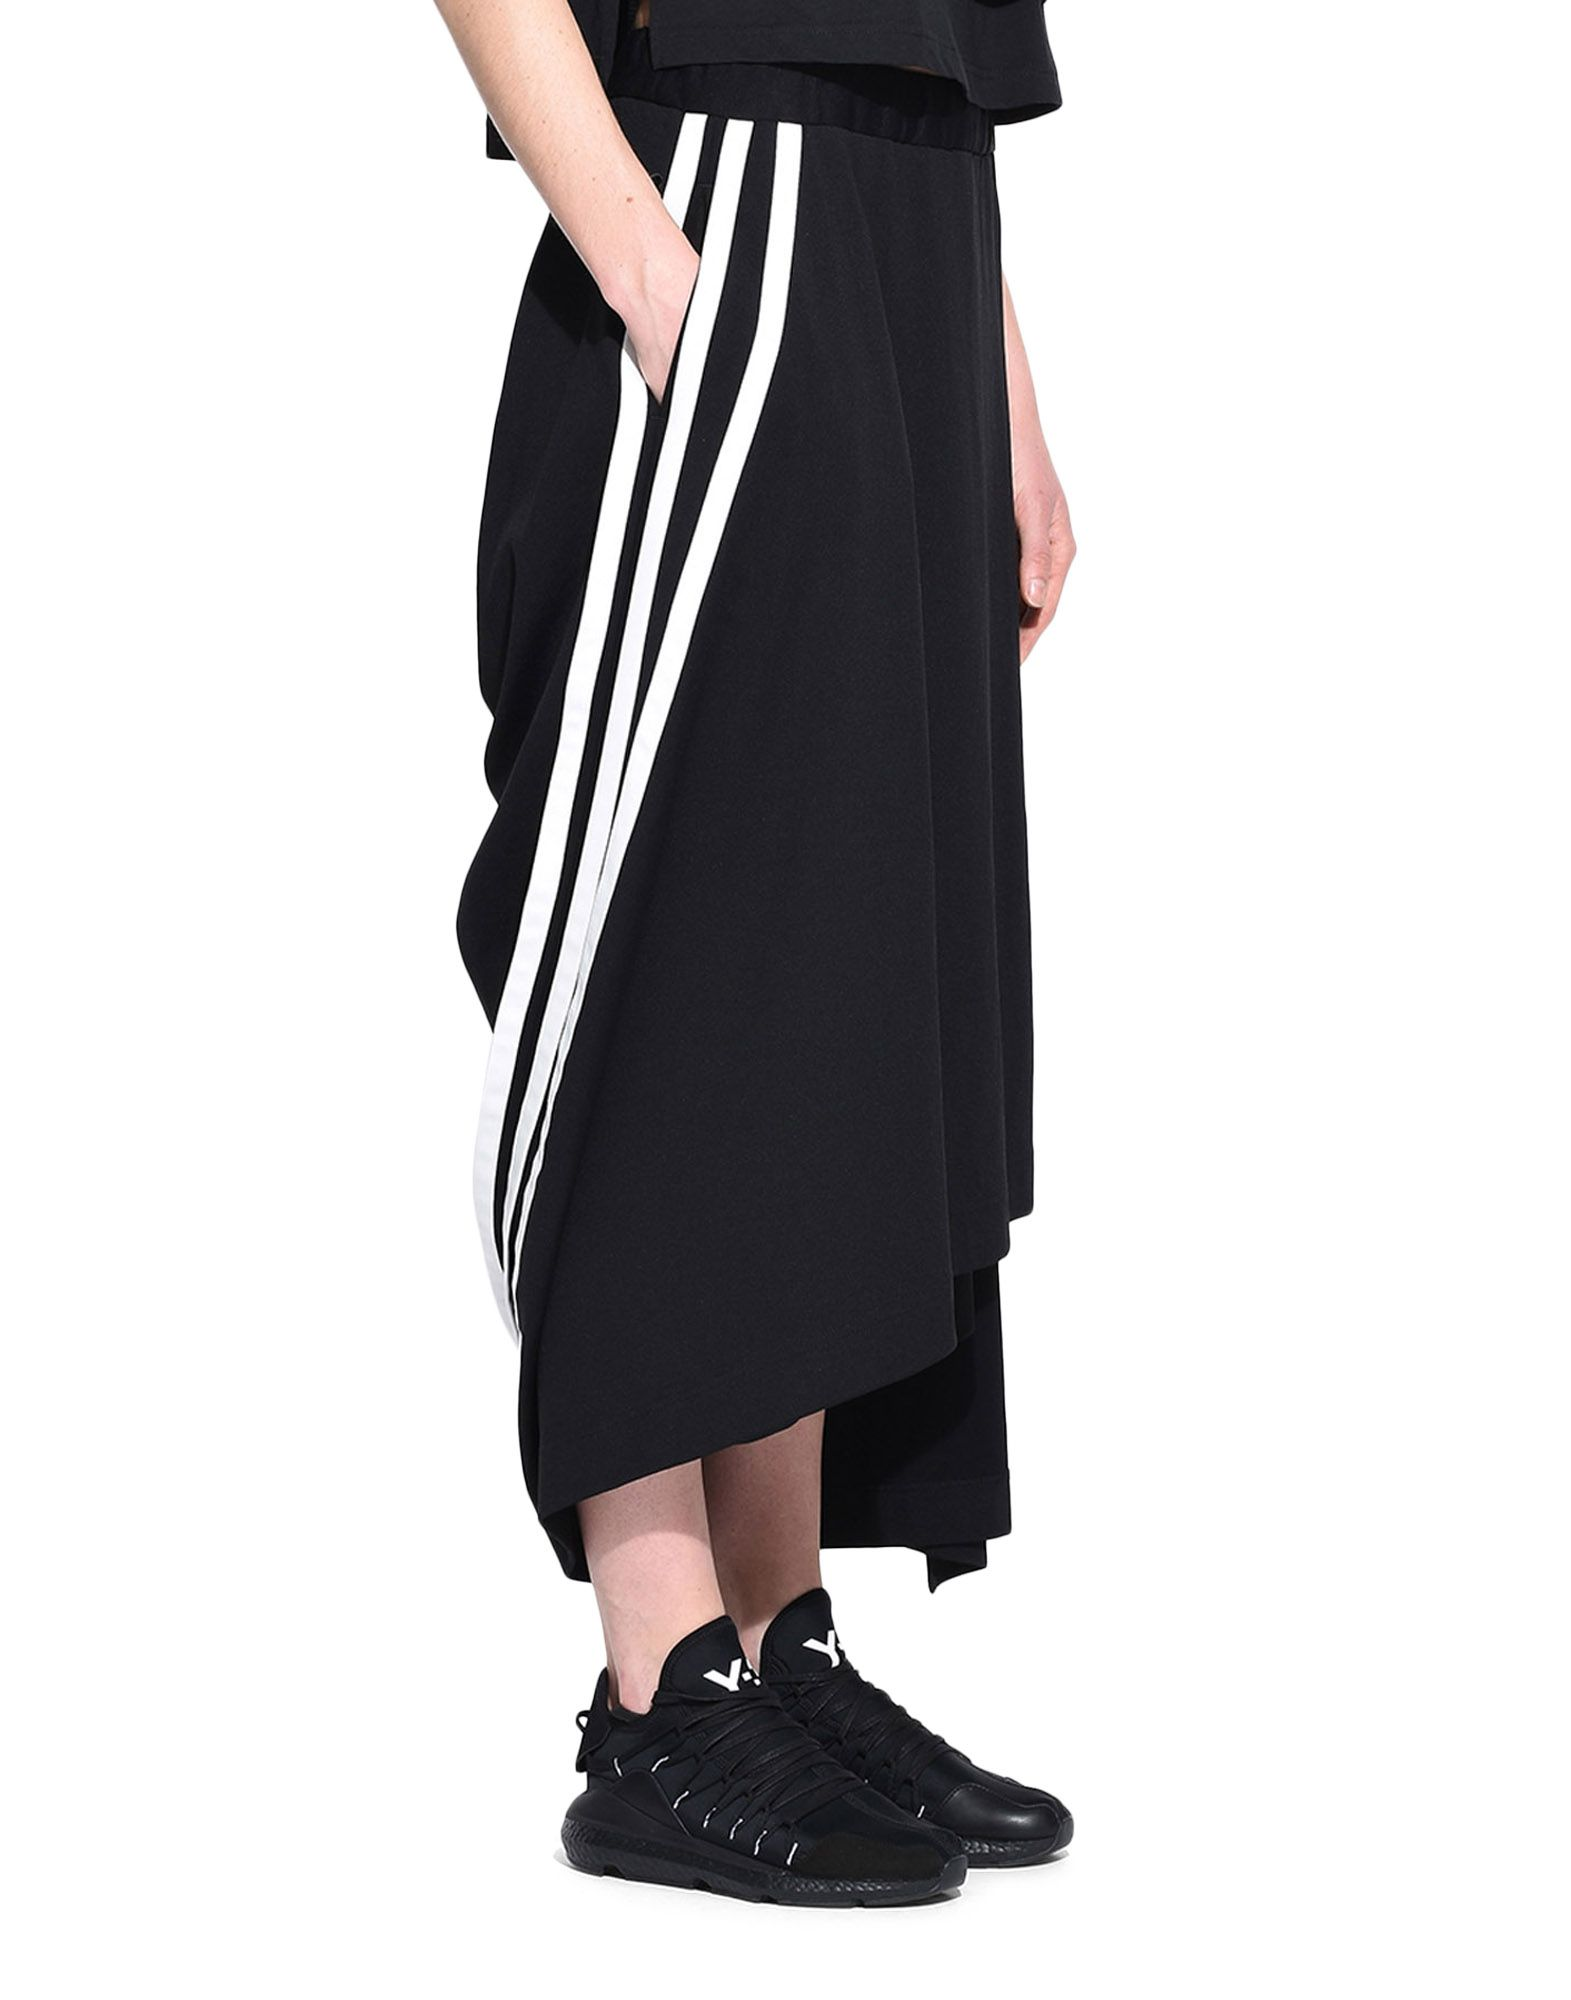 Y-3 Y-3 3-Stripes Drape Skirt Knee length skirt Woman e